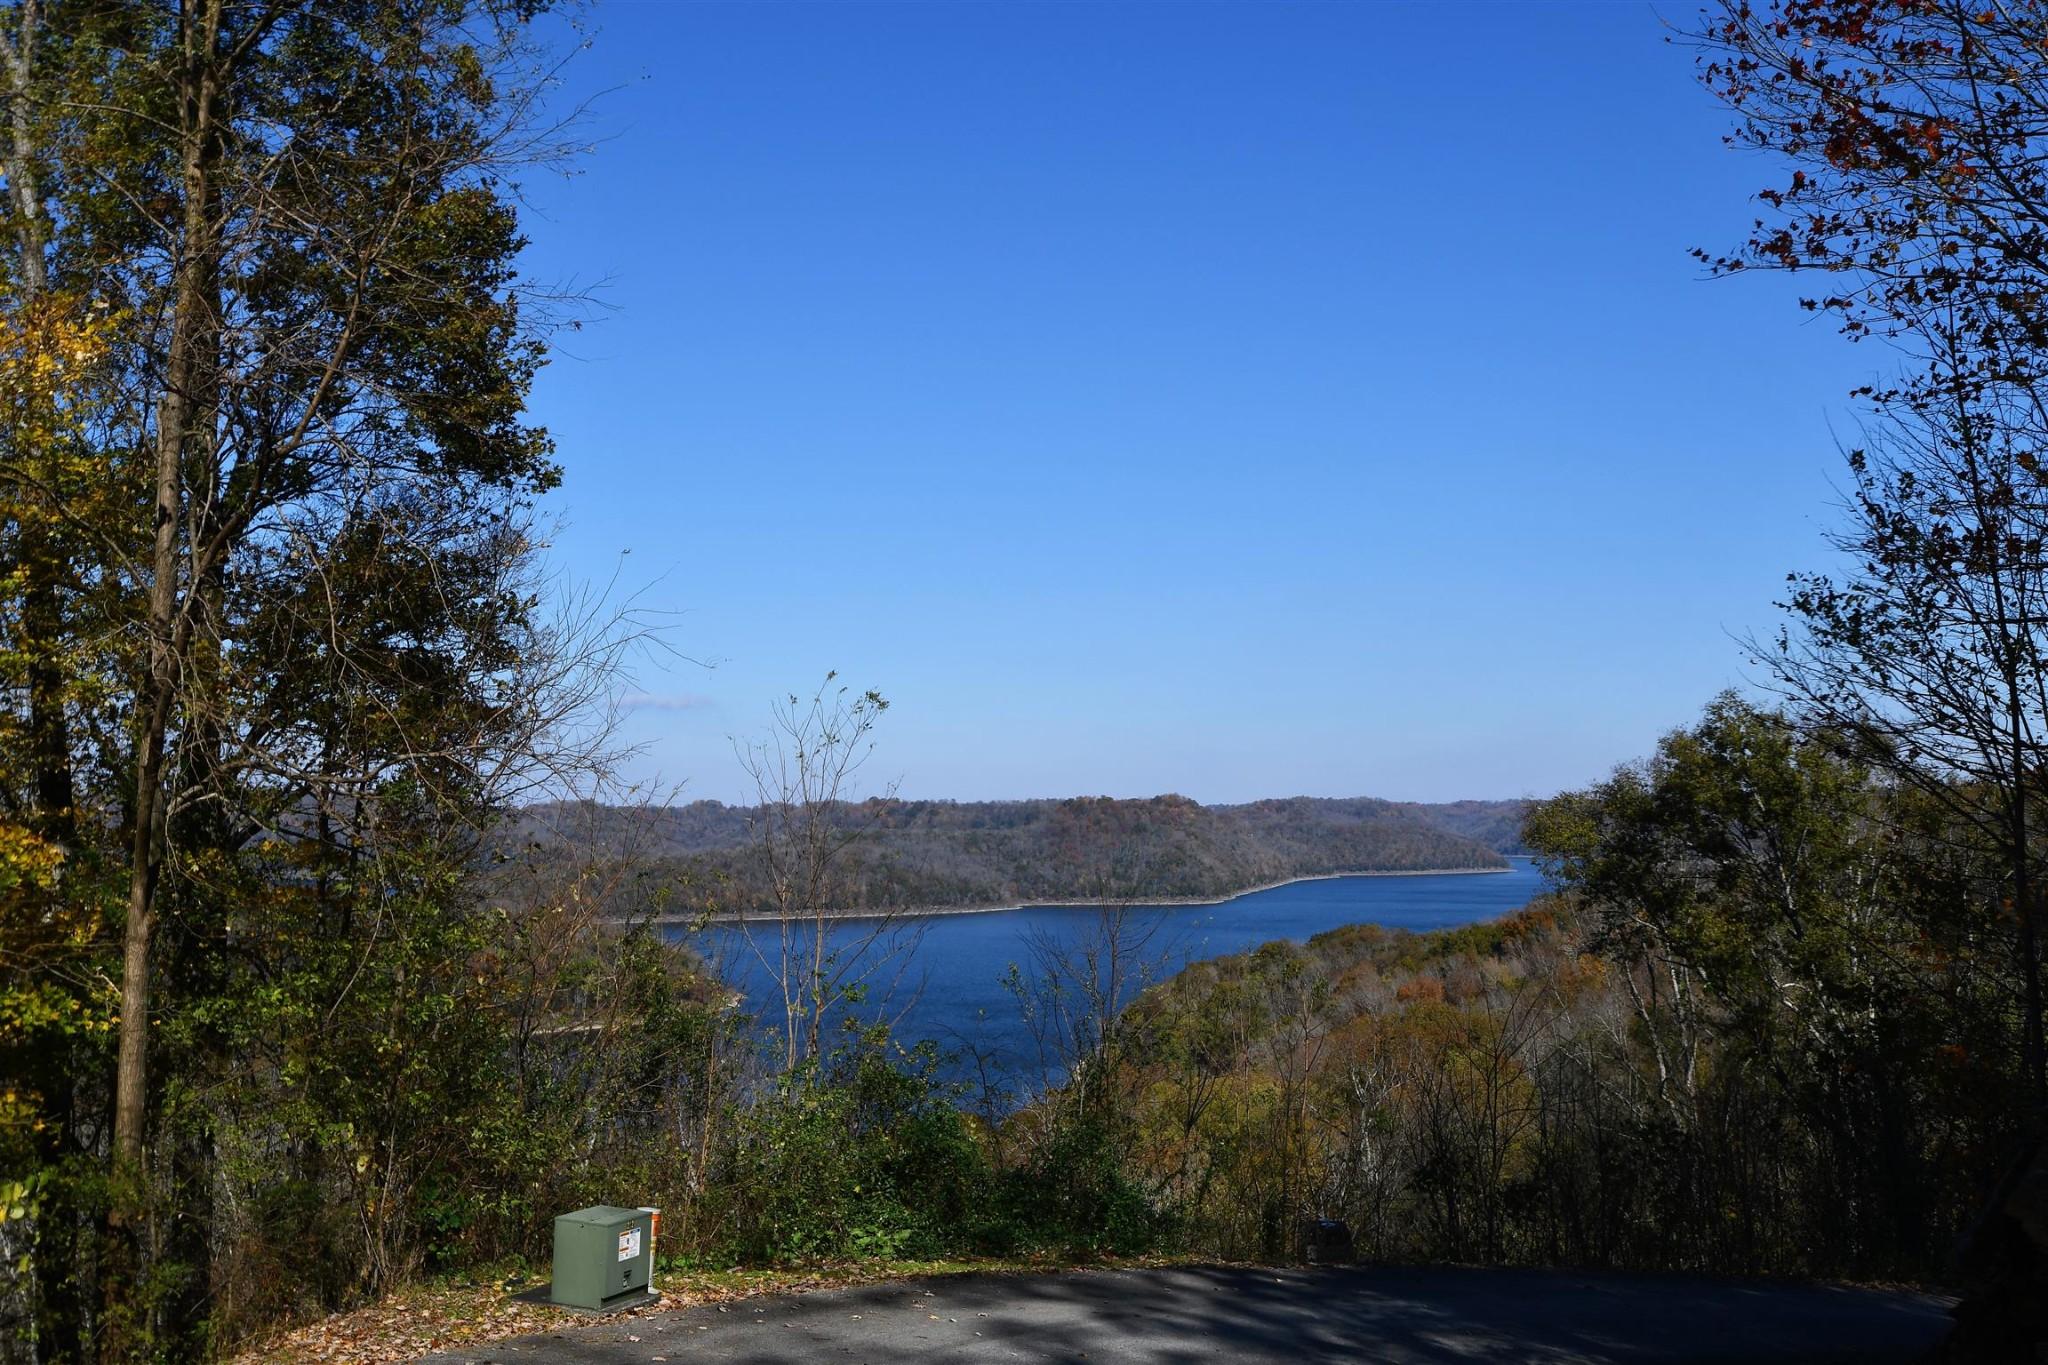 675 Williamson Cir Property Photo - Smithville, TN real estate listing